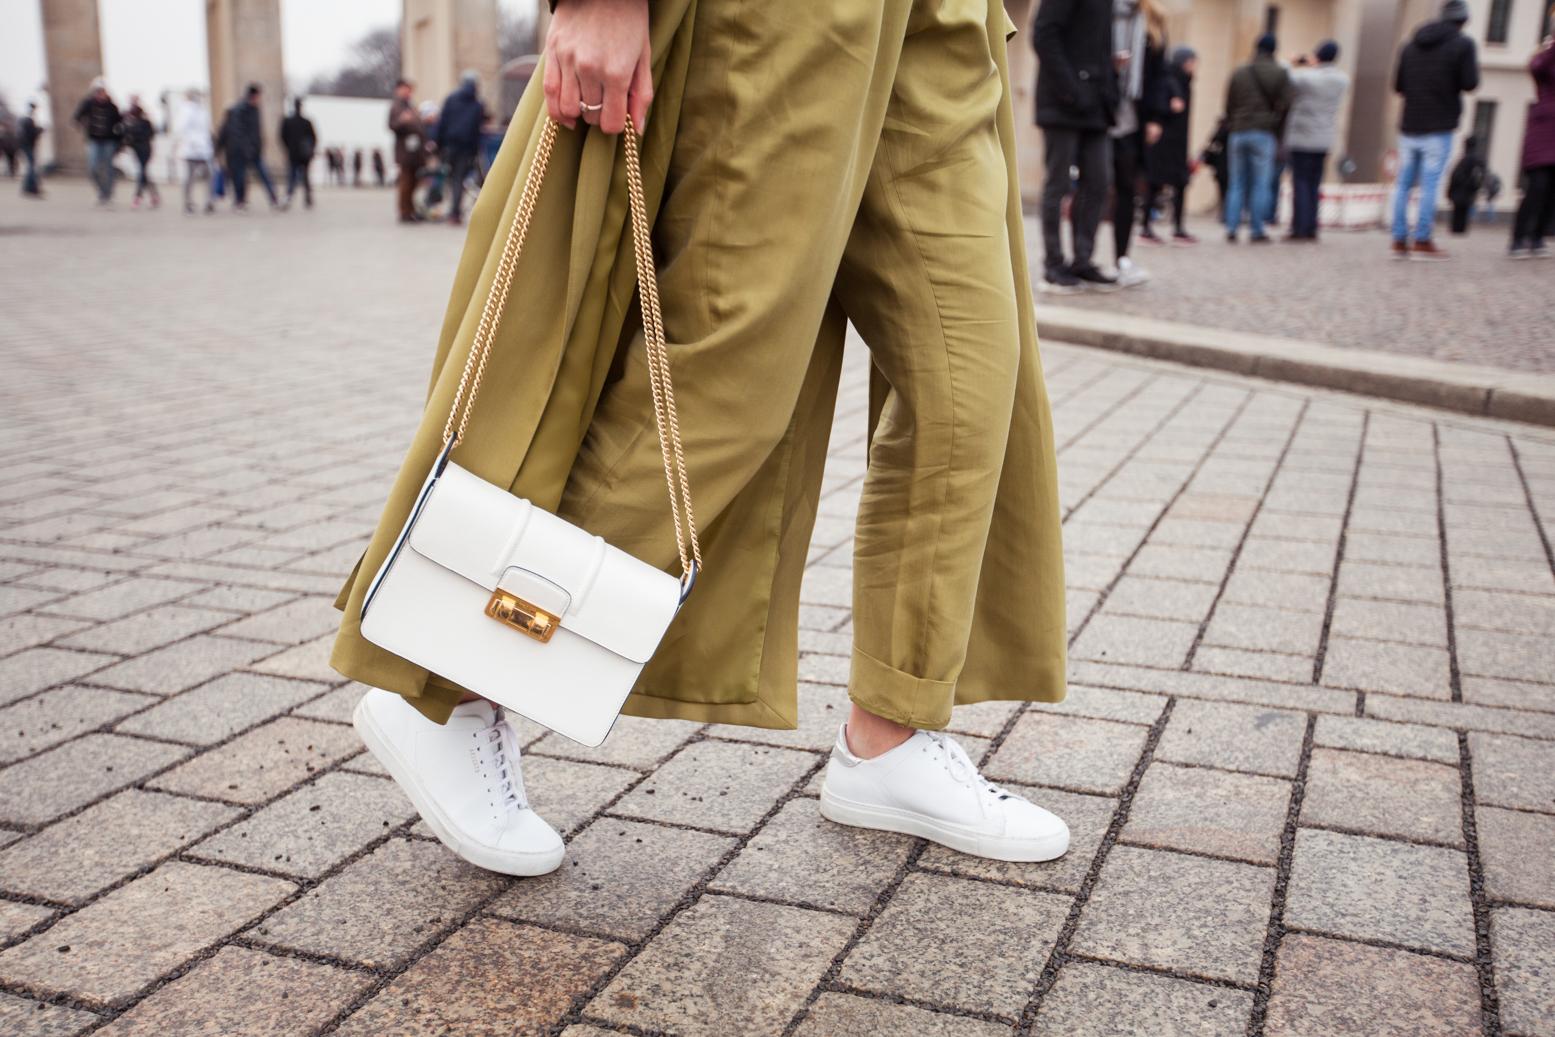 fashionweek-streetstyle-ivy&oak-livia-auer-6015